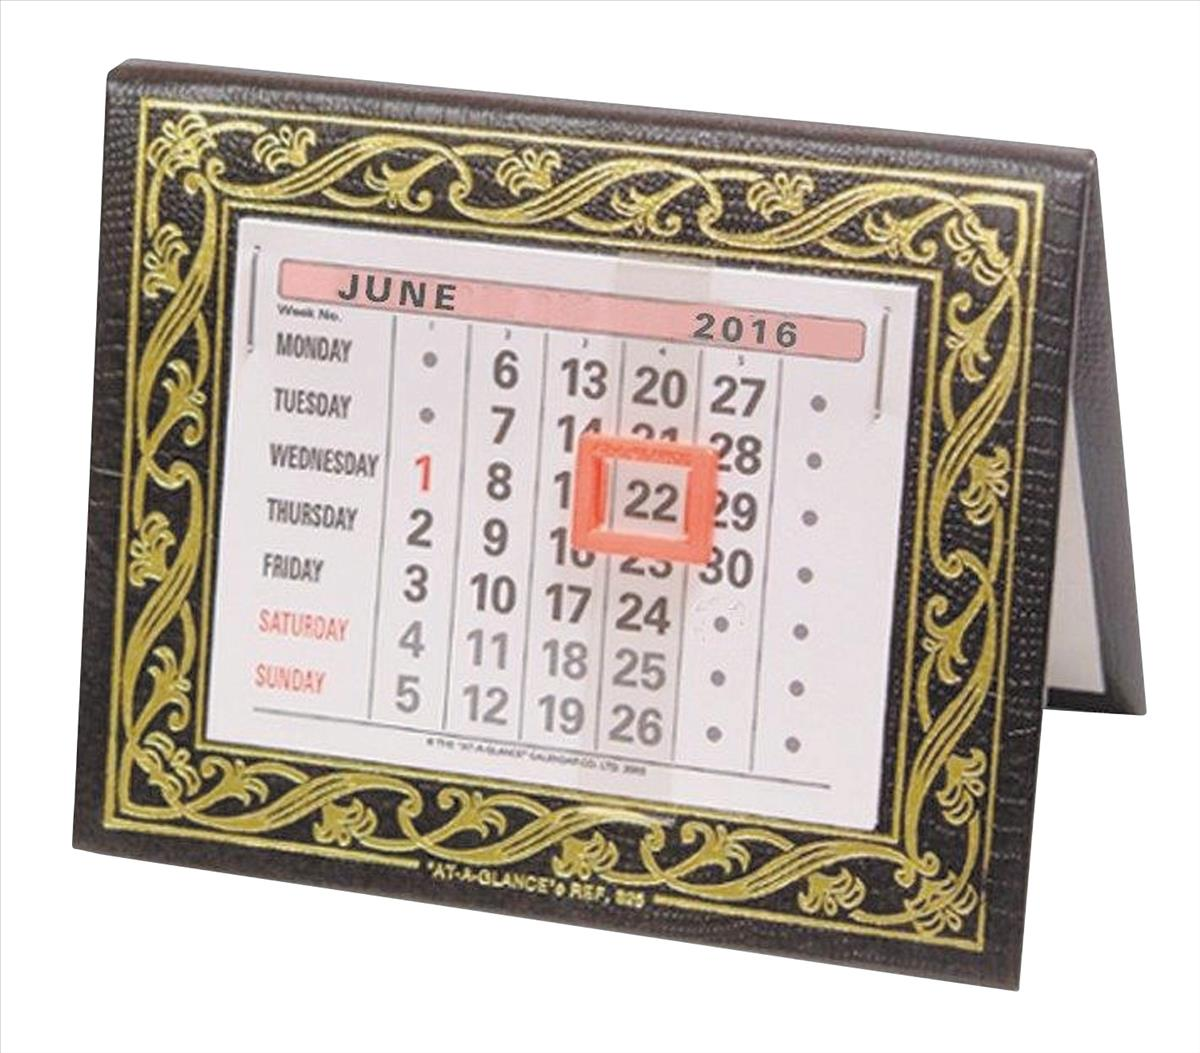 At A Glance 2016 Desk Calendar 825